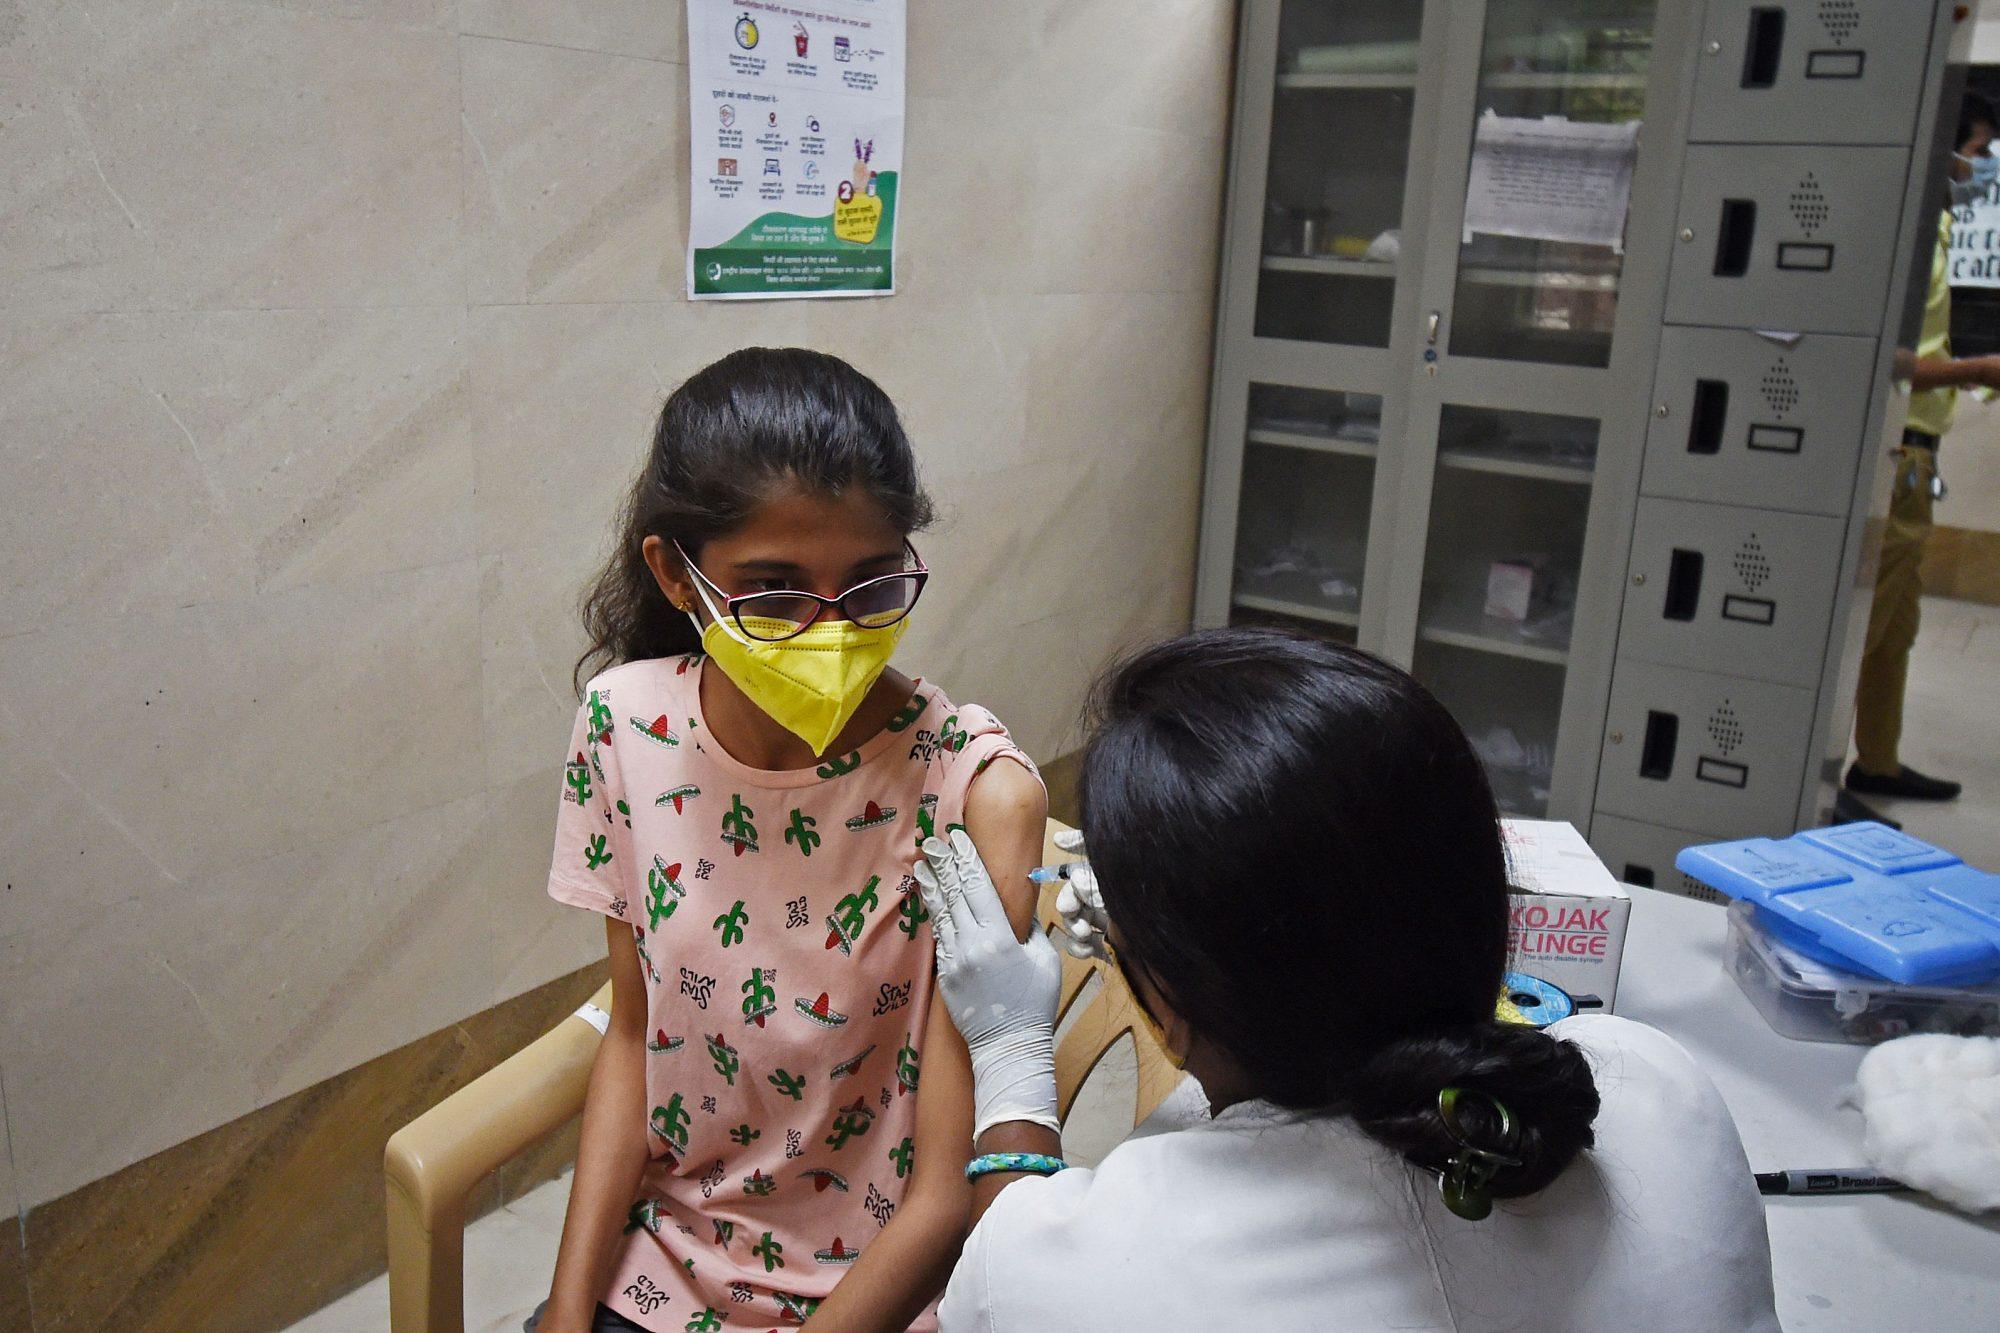 Vacuna coronavirus niños 12-15